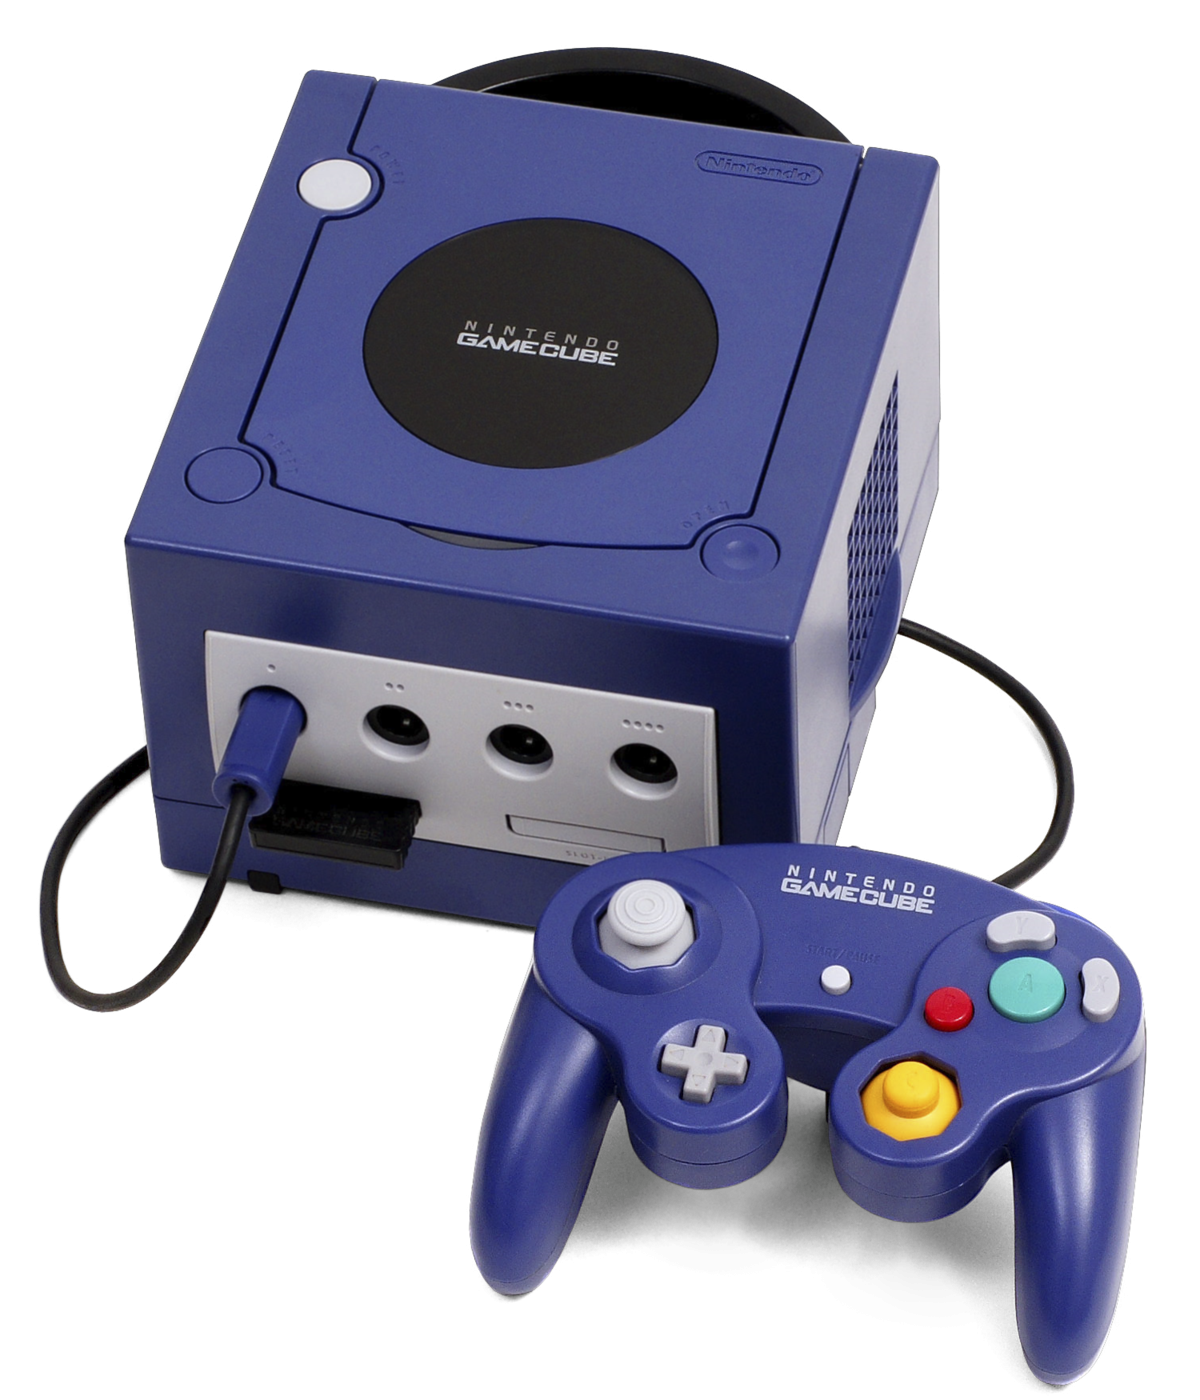 1200px-Gamecube-console